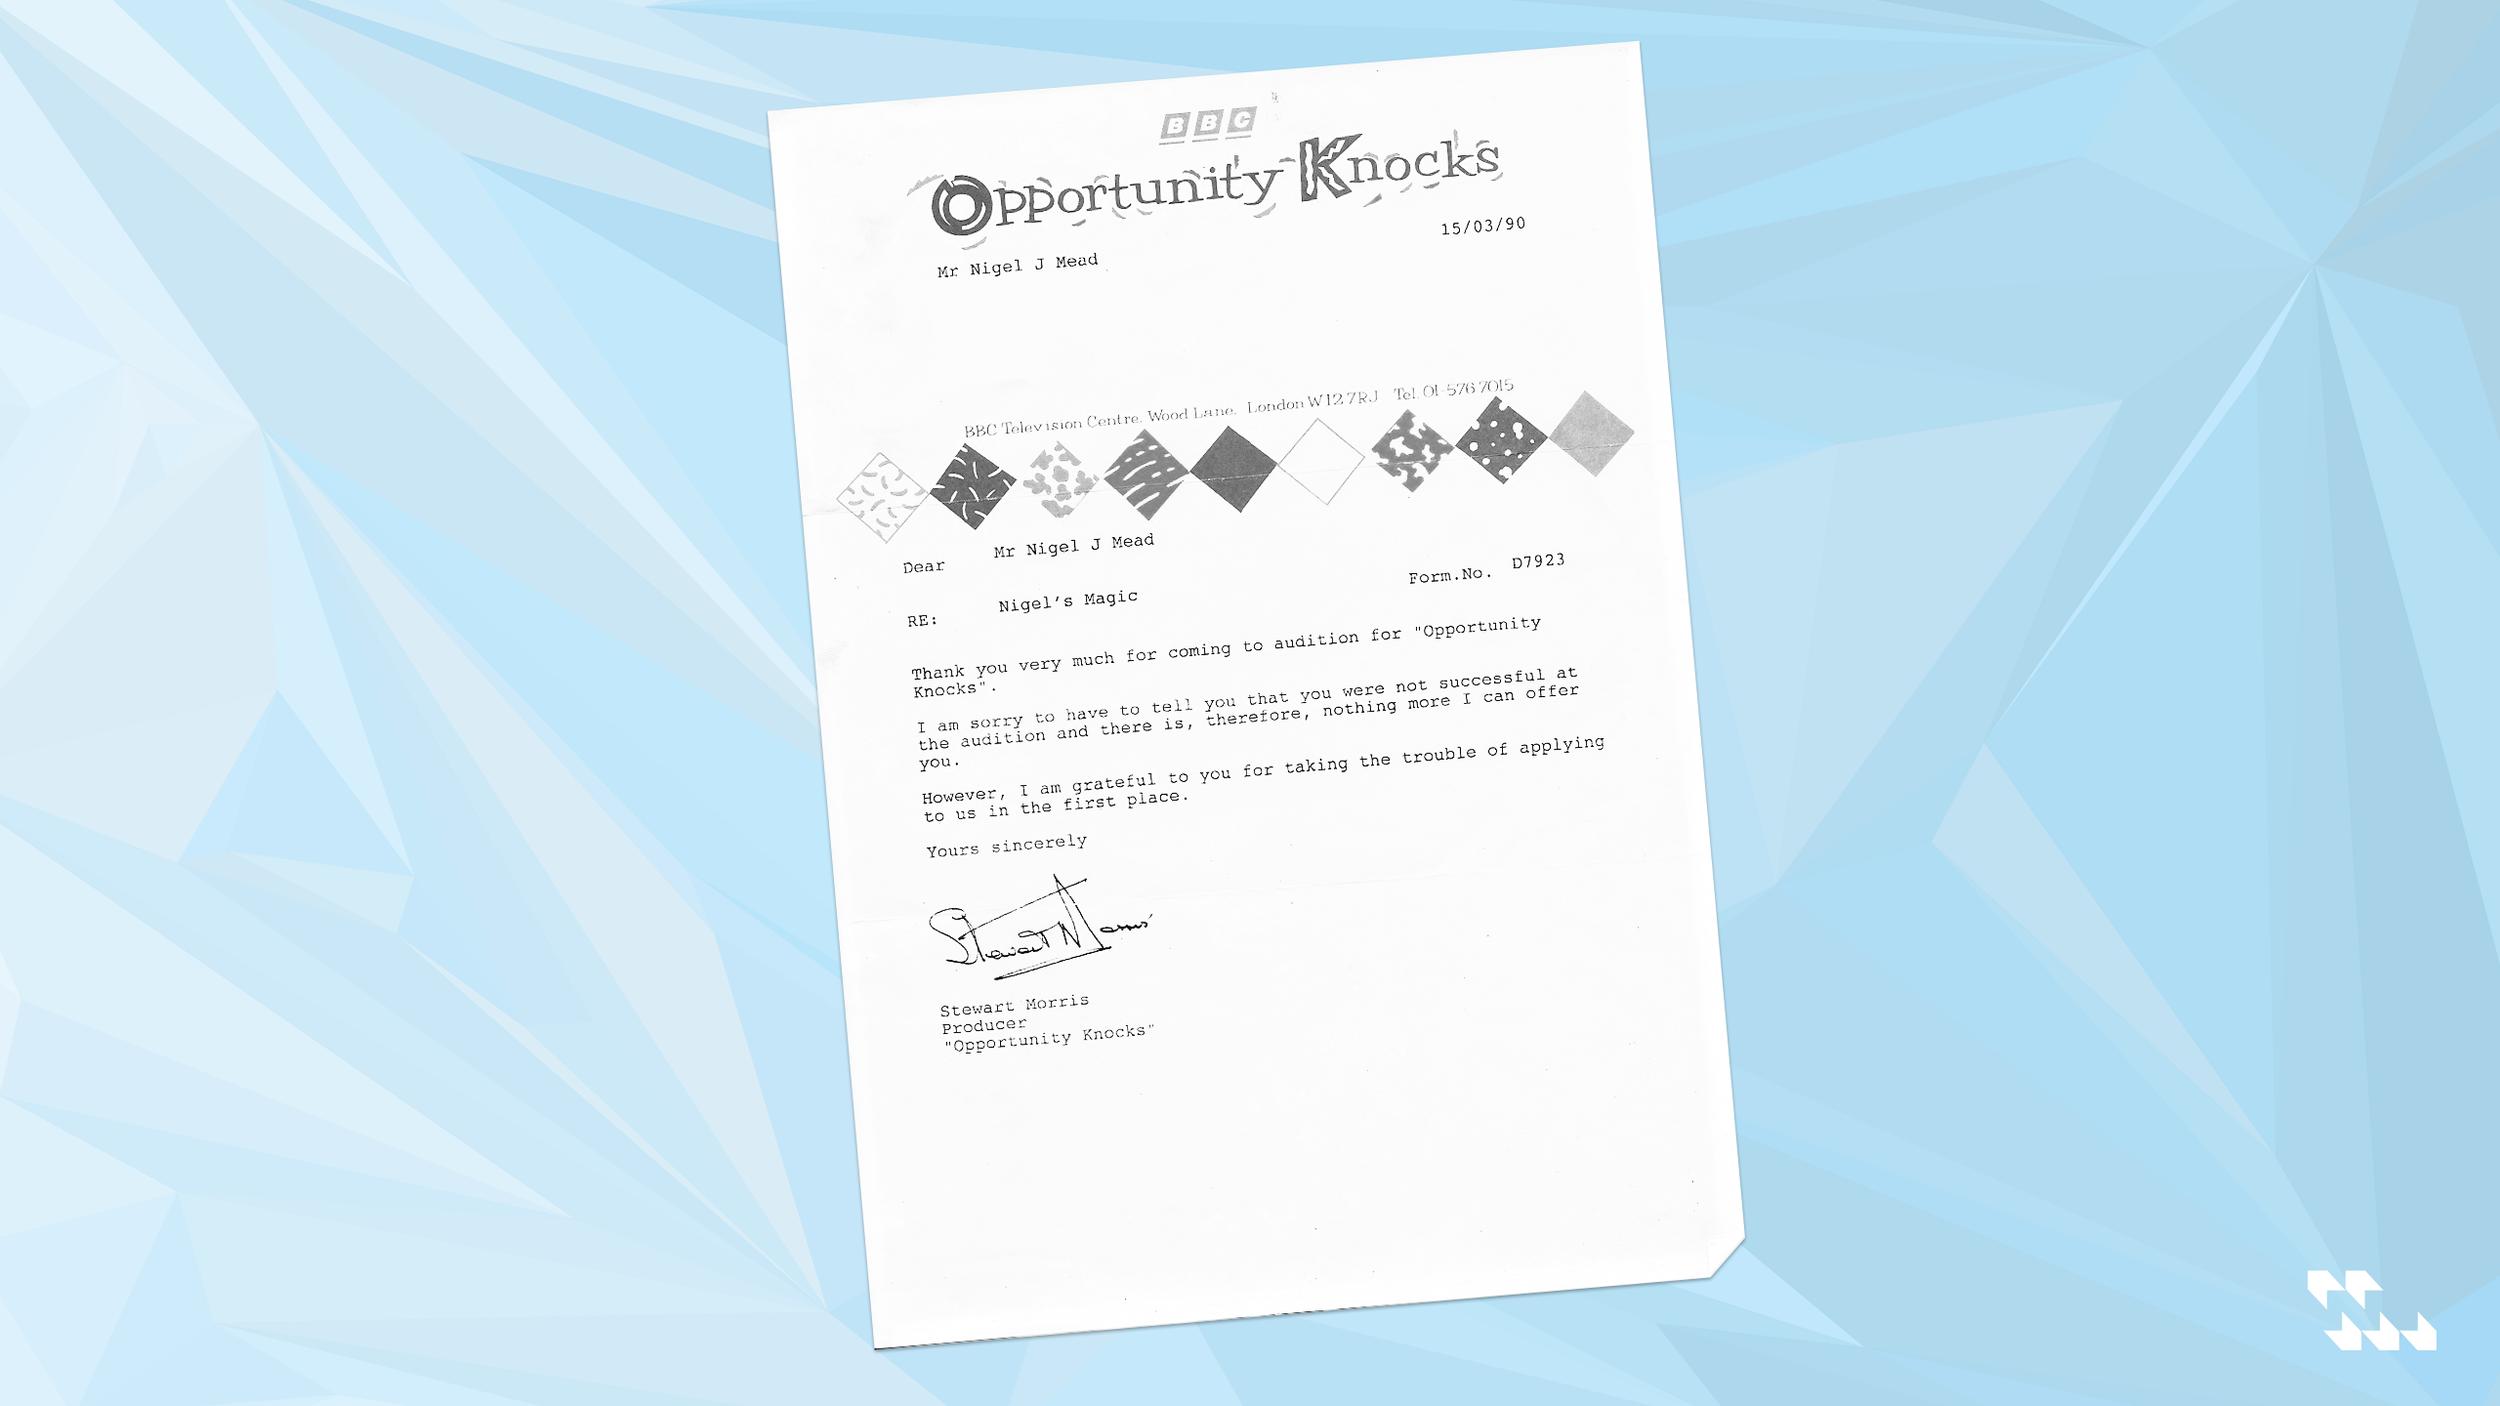 opportunity_knocks_letter.png